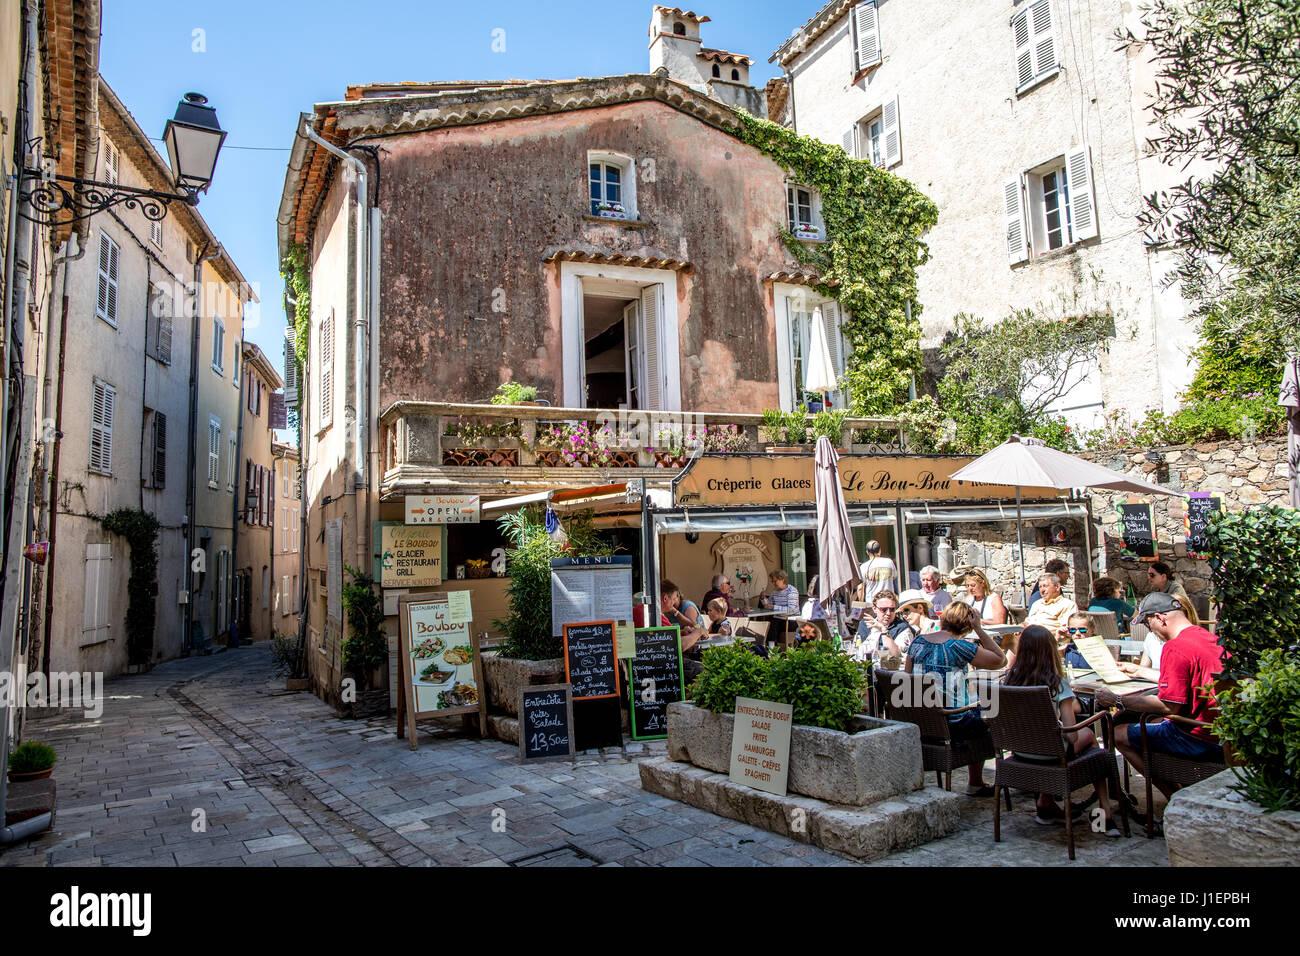 restaurant in grimaud medieval village cote d 39 azure france stock photo 138622501 alamy. Black Bedroom Furniture Sets. Home Design Ideas